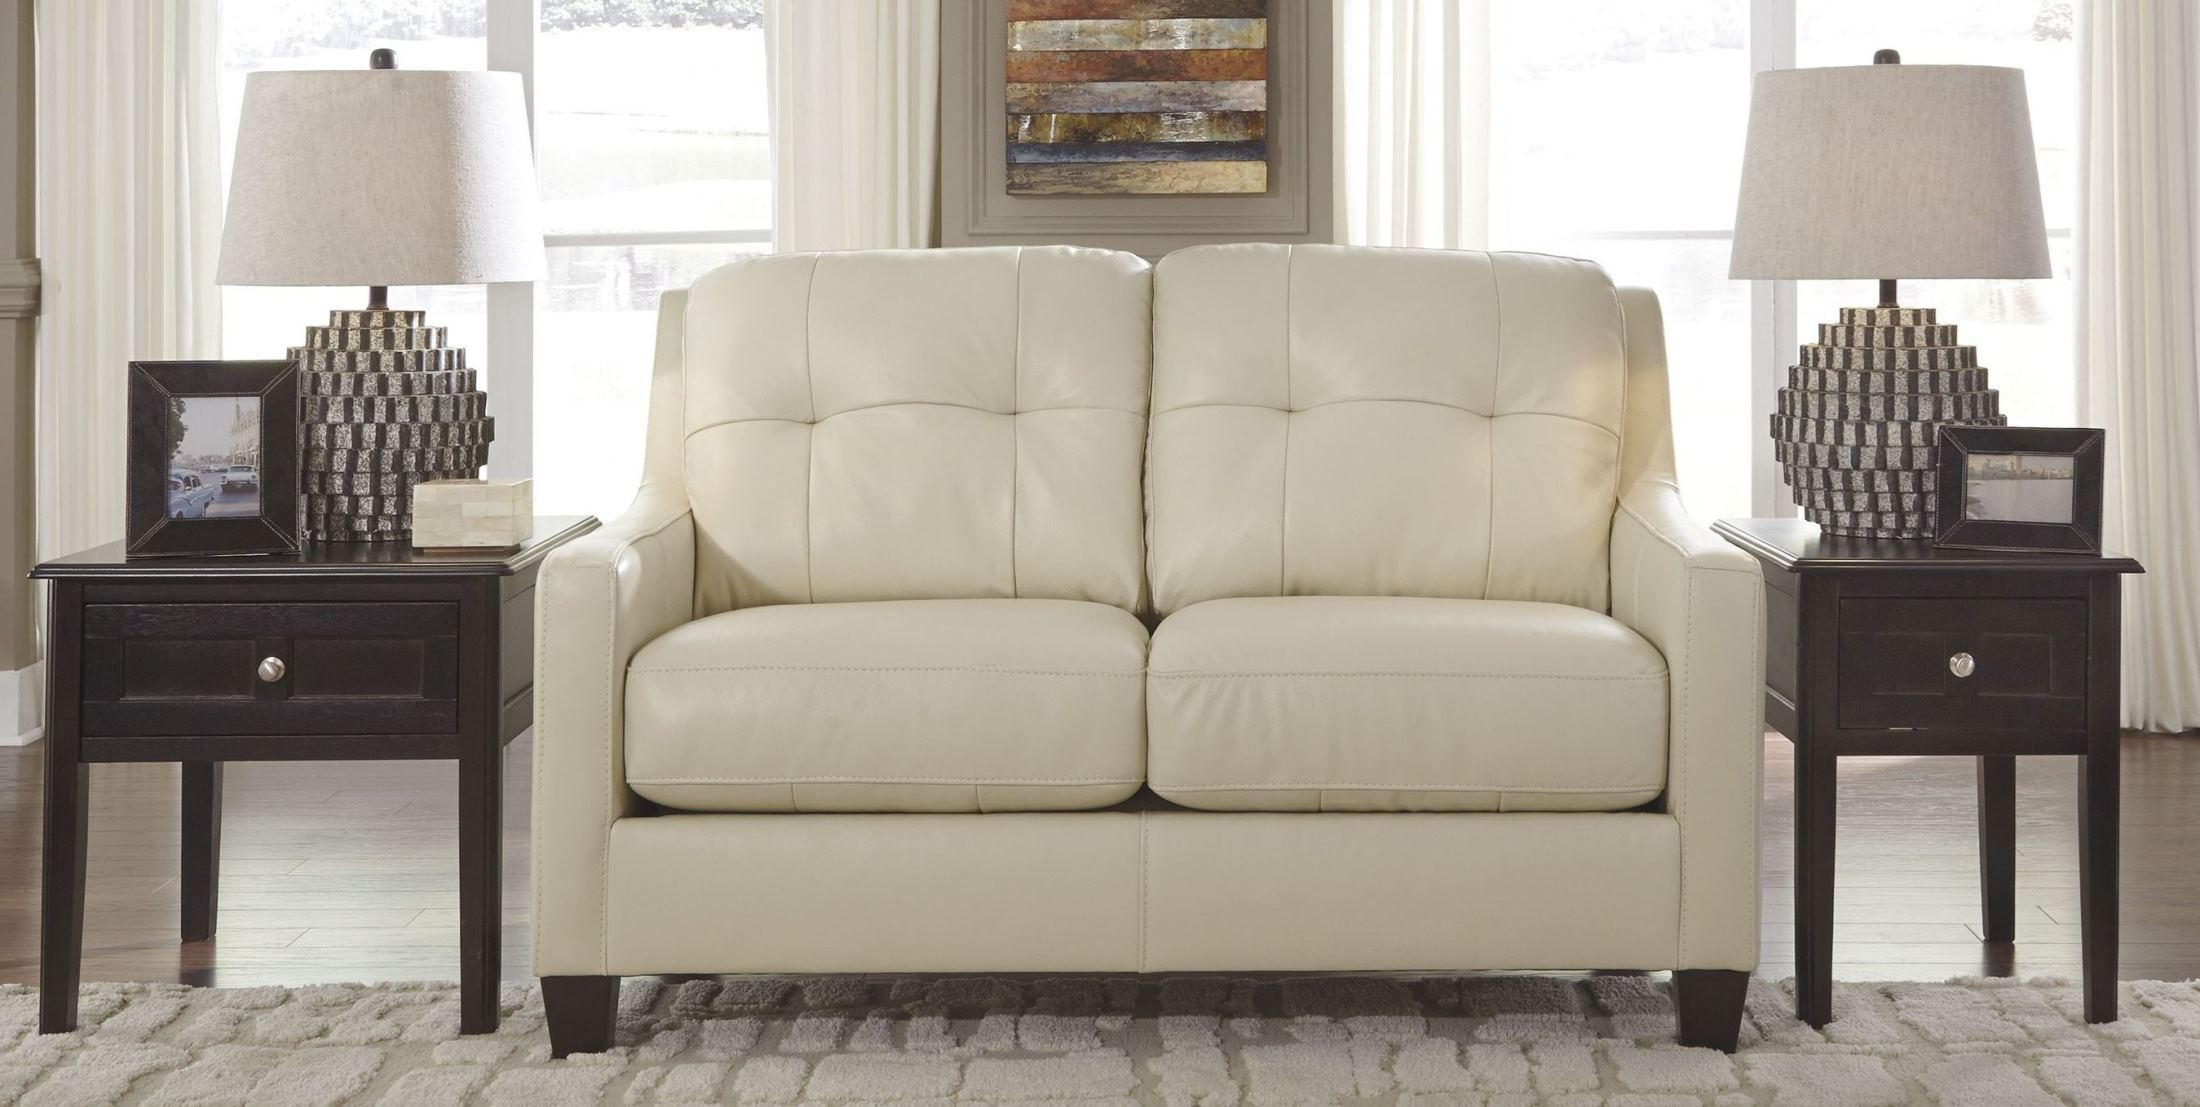 O Kean Galaxy Loveseat From Ashley Coleman Furniture